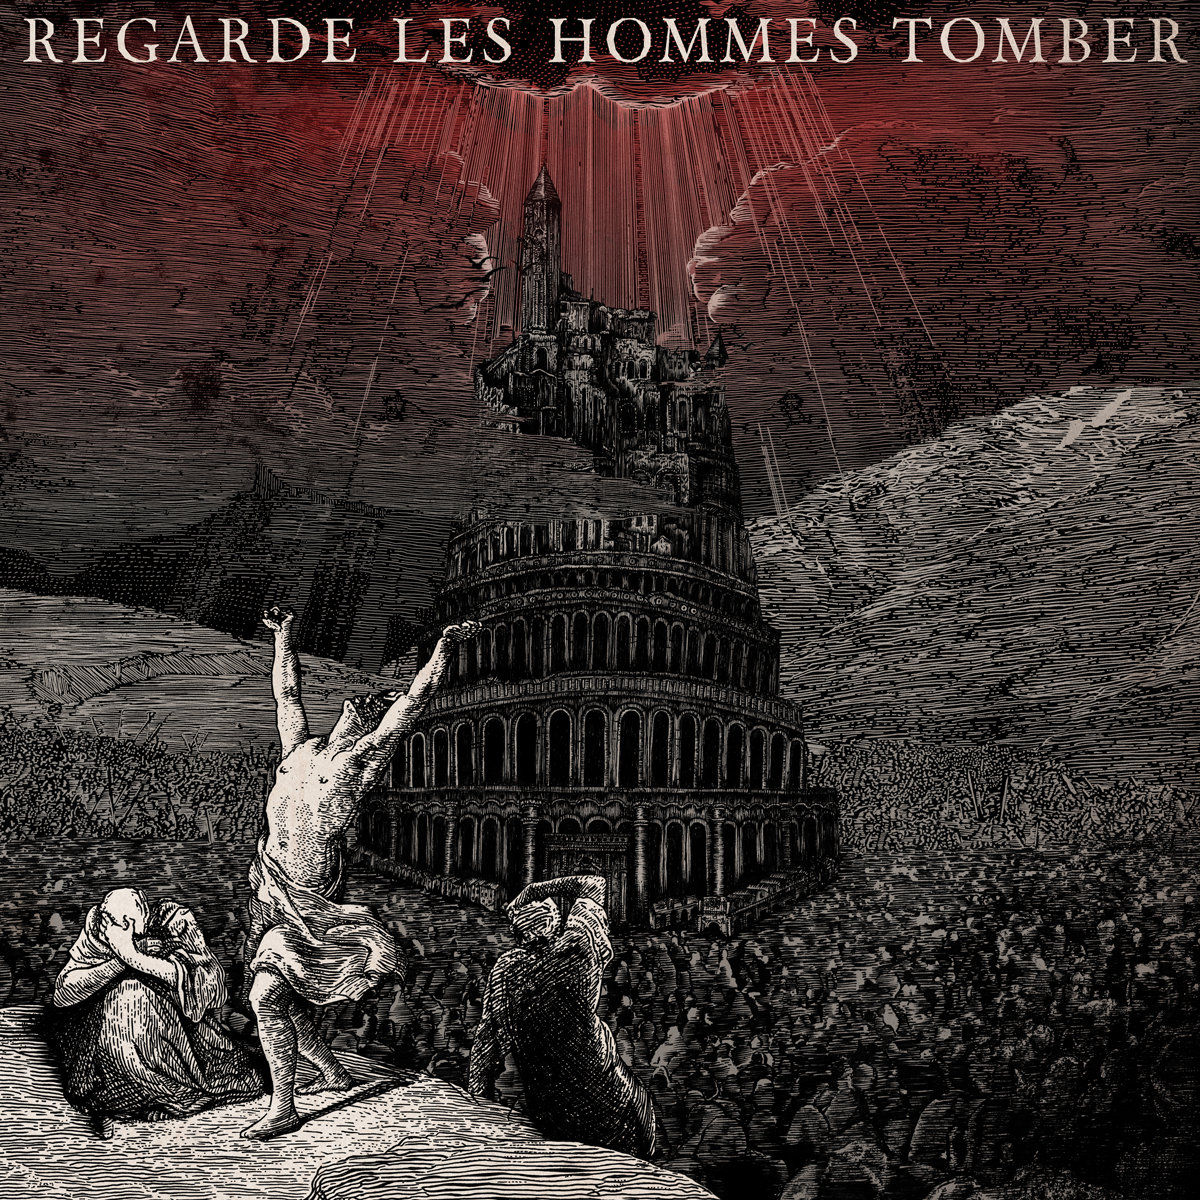 REGARDE LES HOMMES TOMBER s/t – Vinyl LP (transparent red)